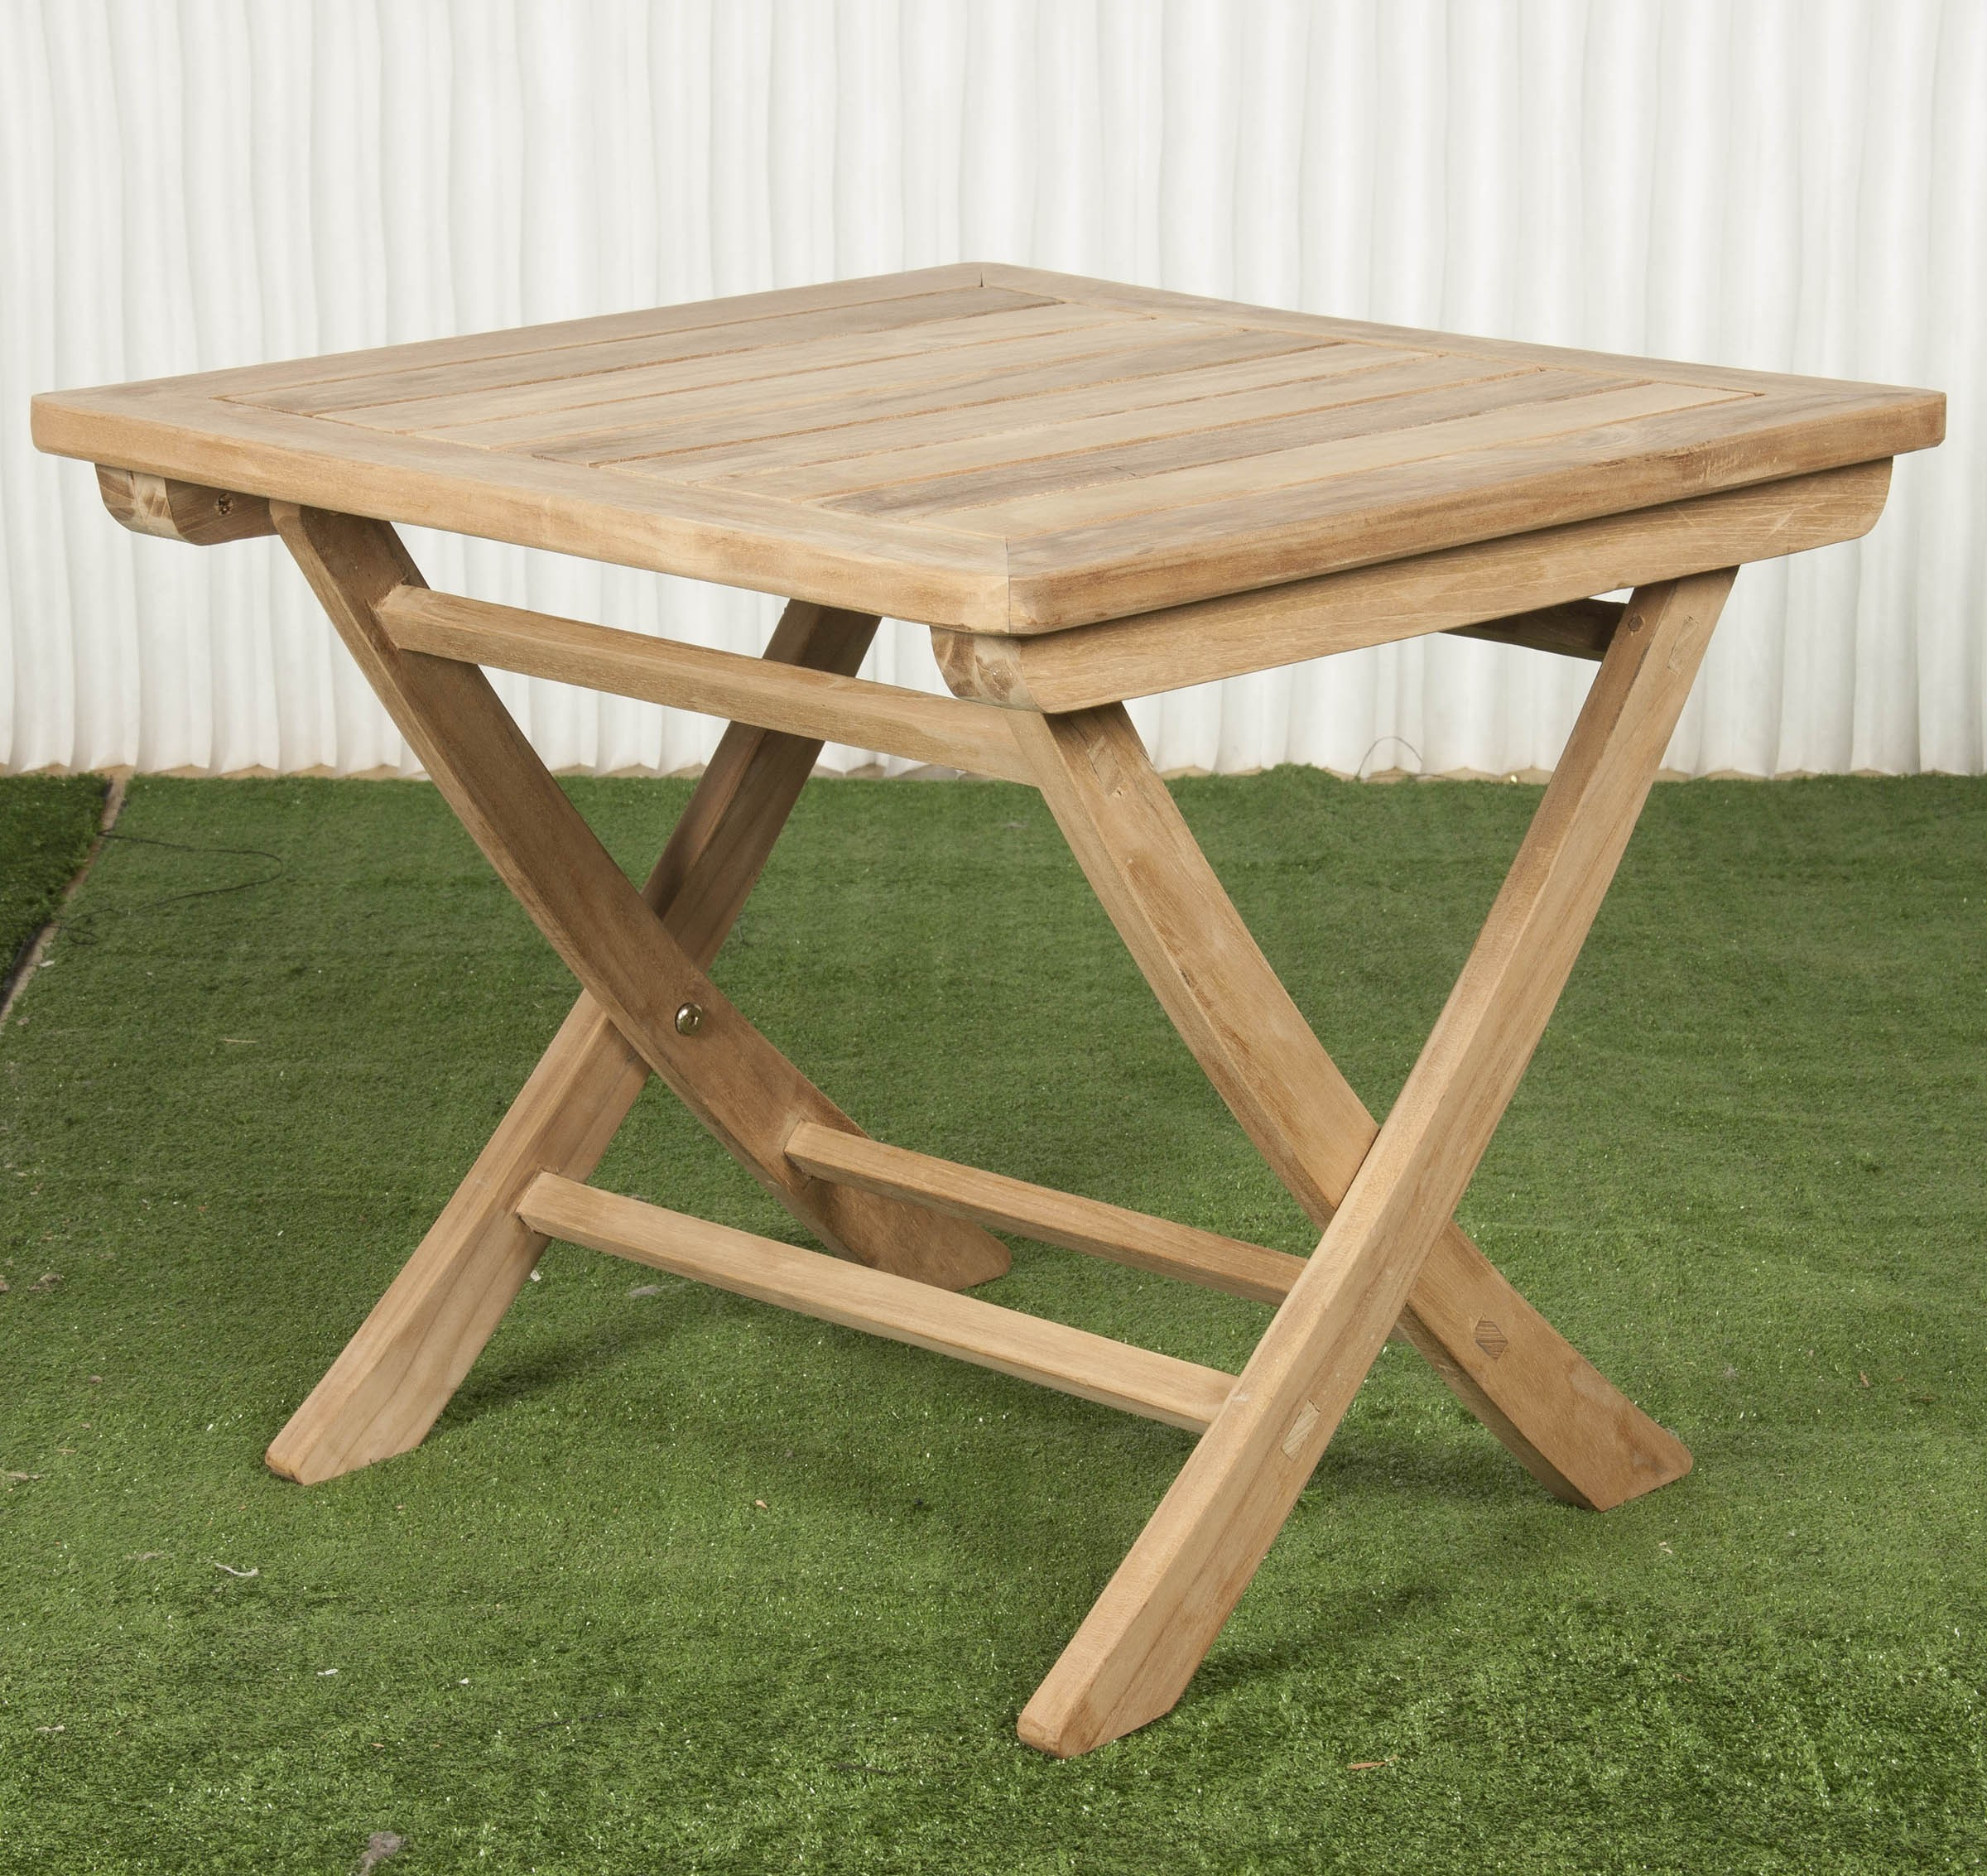 Mesas de madera plegables para exterior 49144 mesas ideas - Mesas de madera para exterior ...